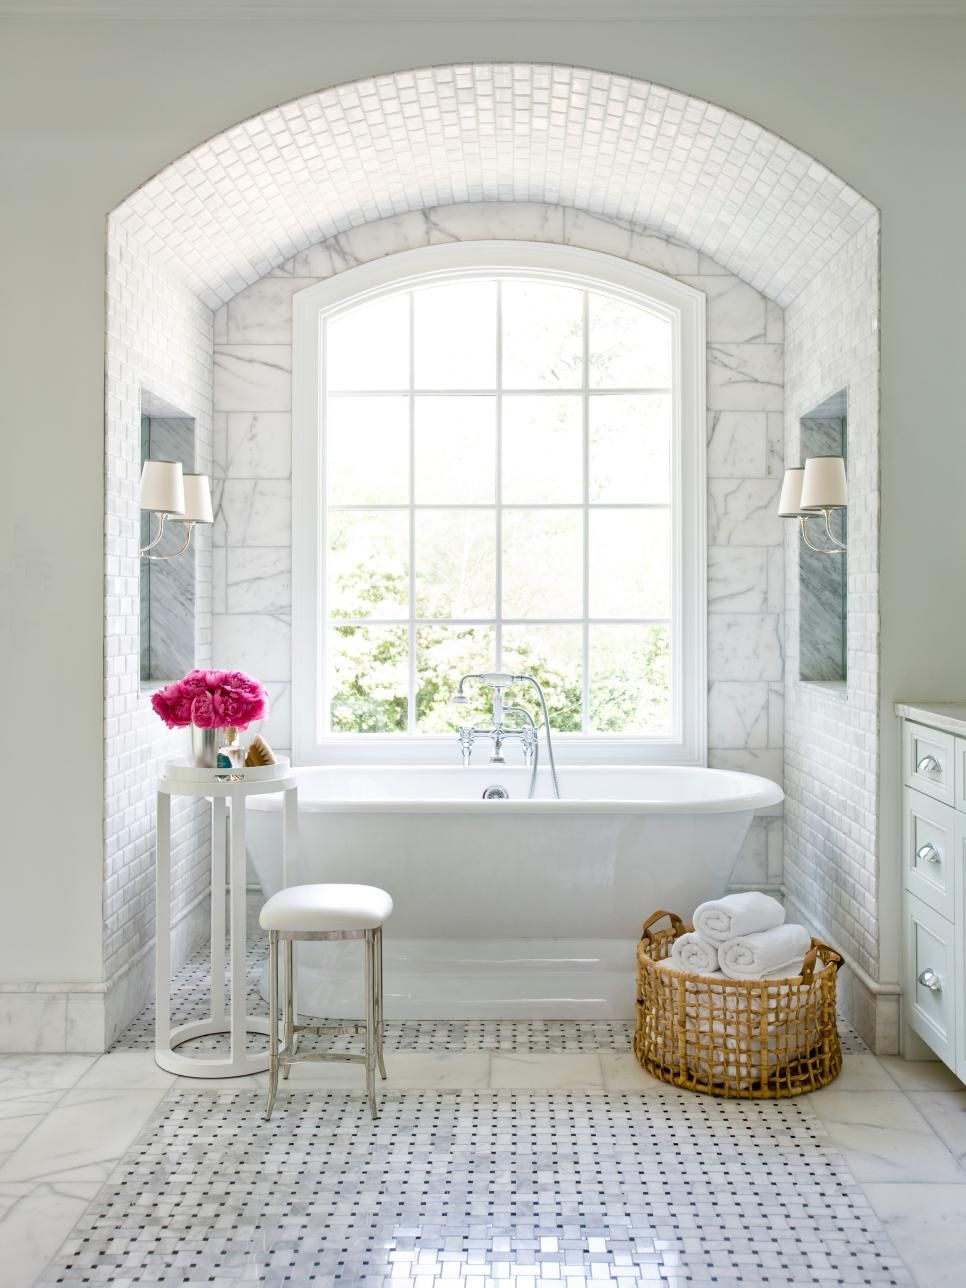 15 Simply Chic Bathroom Tile Design Ideas   Carrara marble, Marbles ...